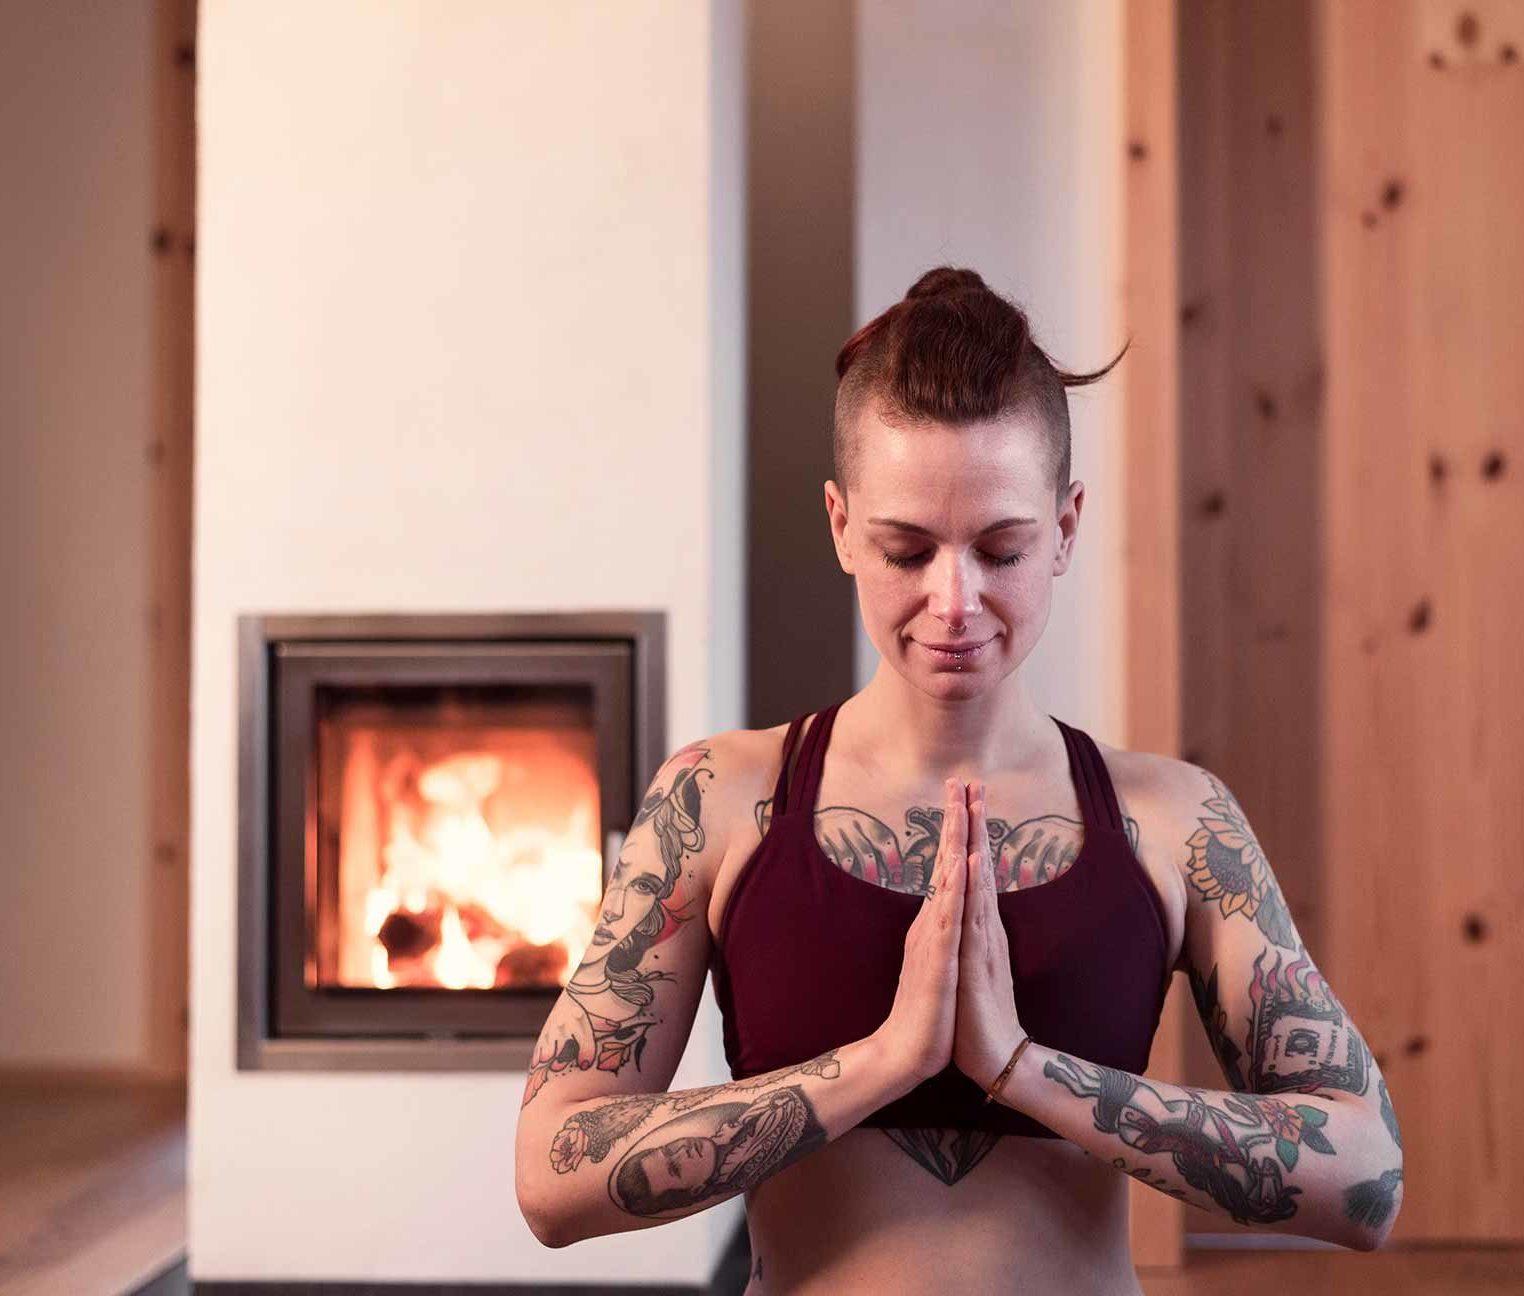 Frau meditiert vor Ofen